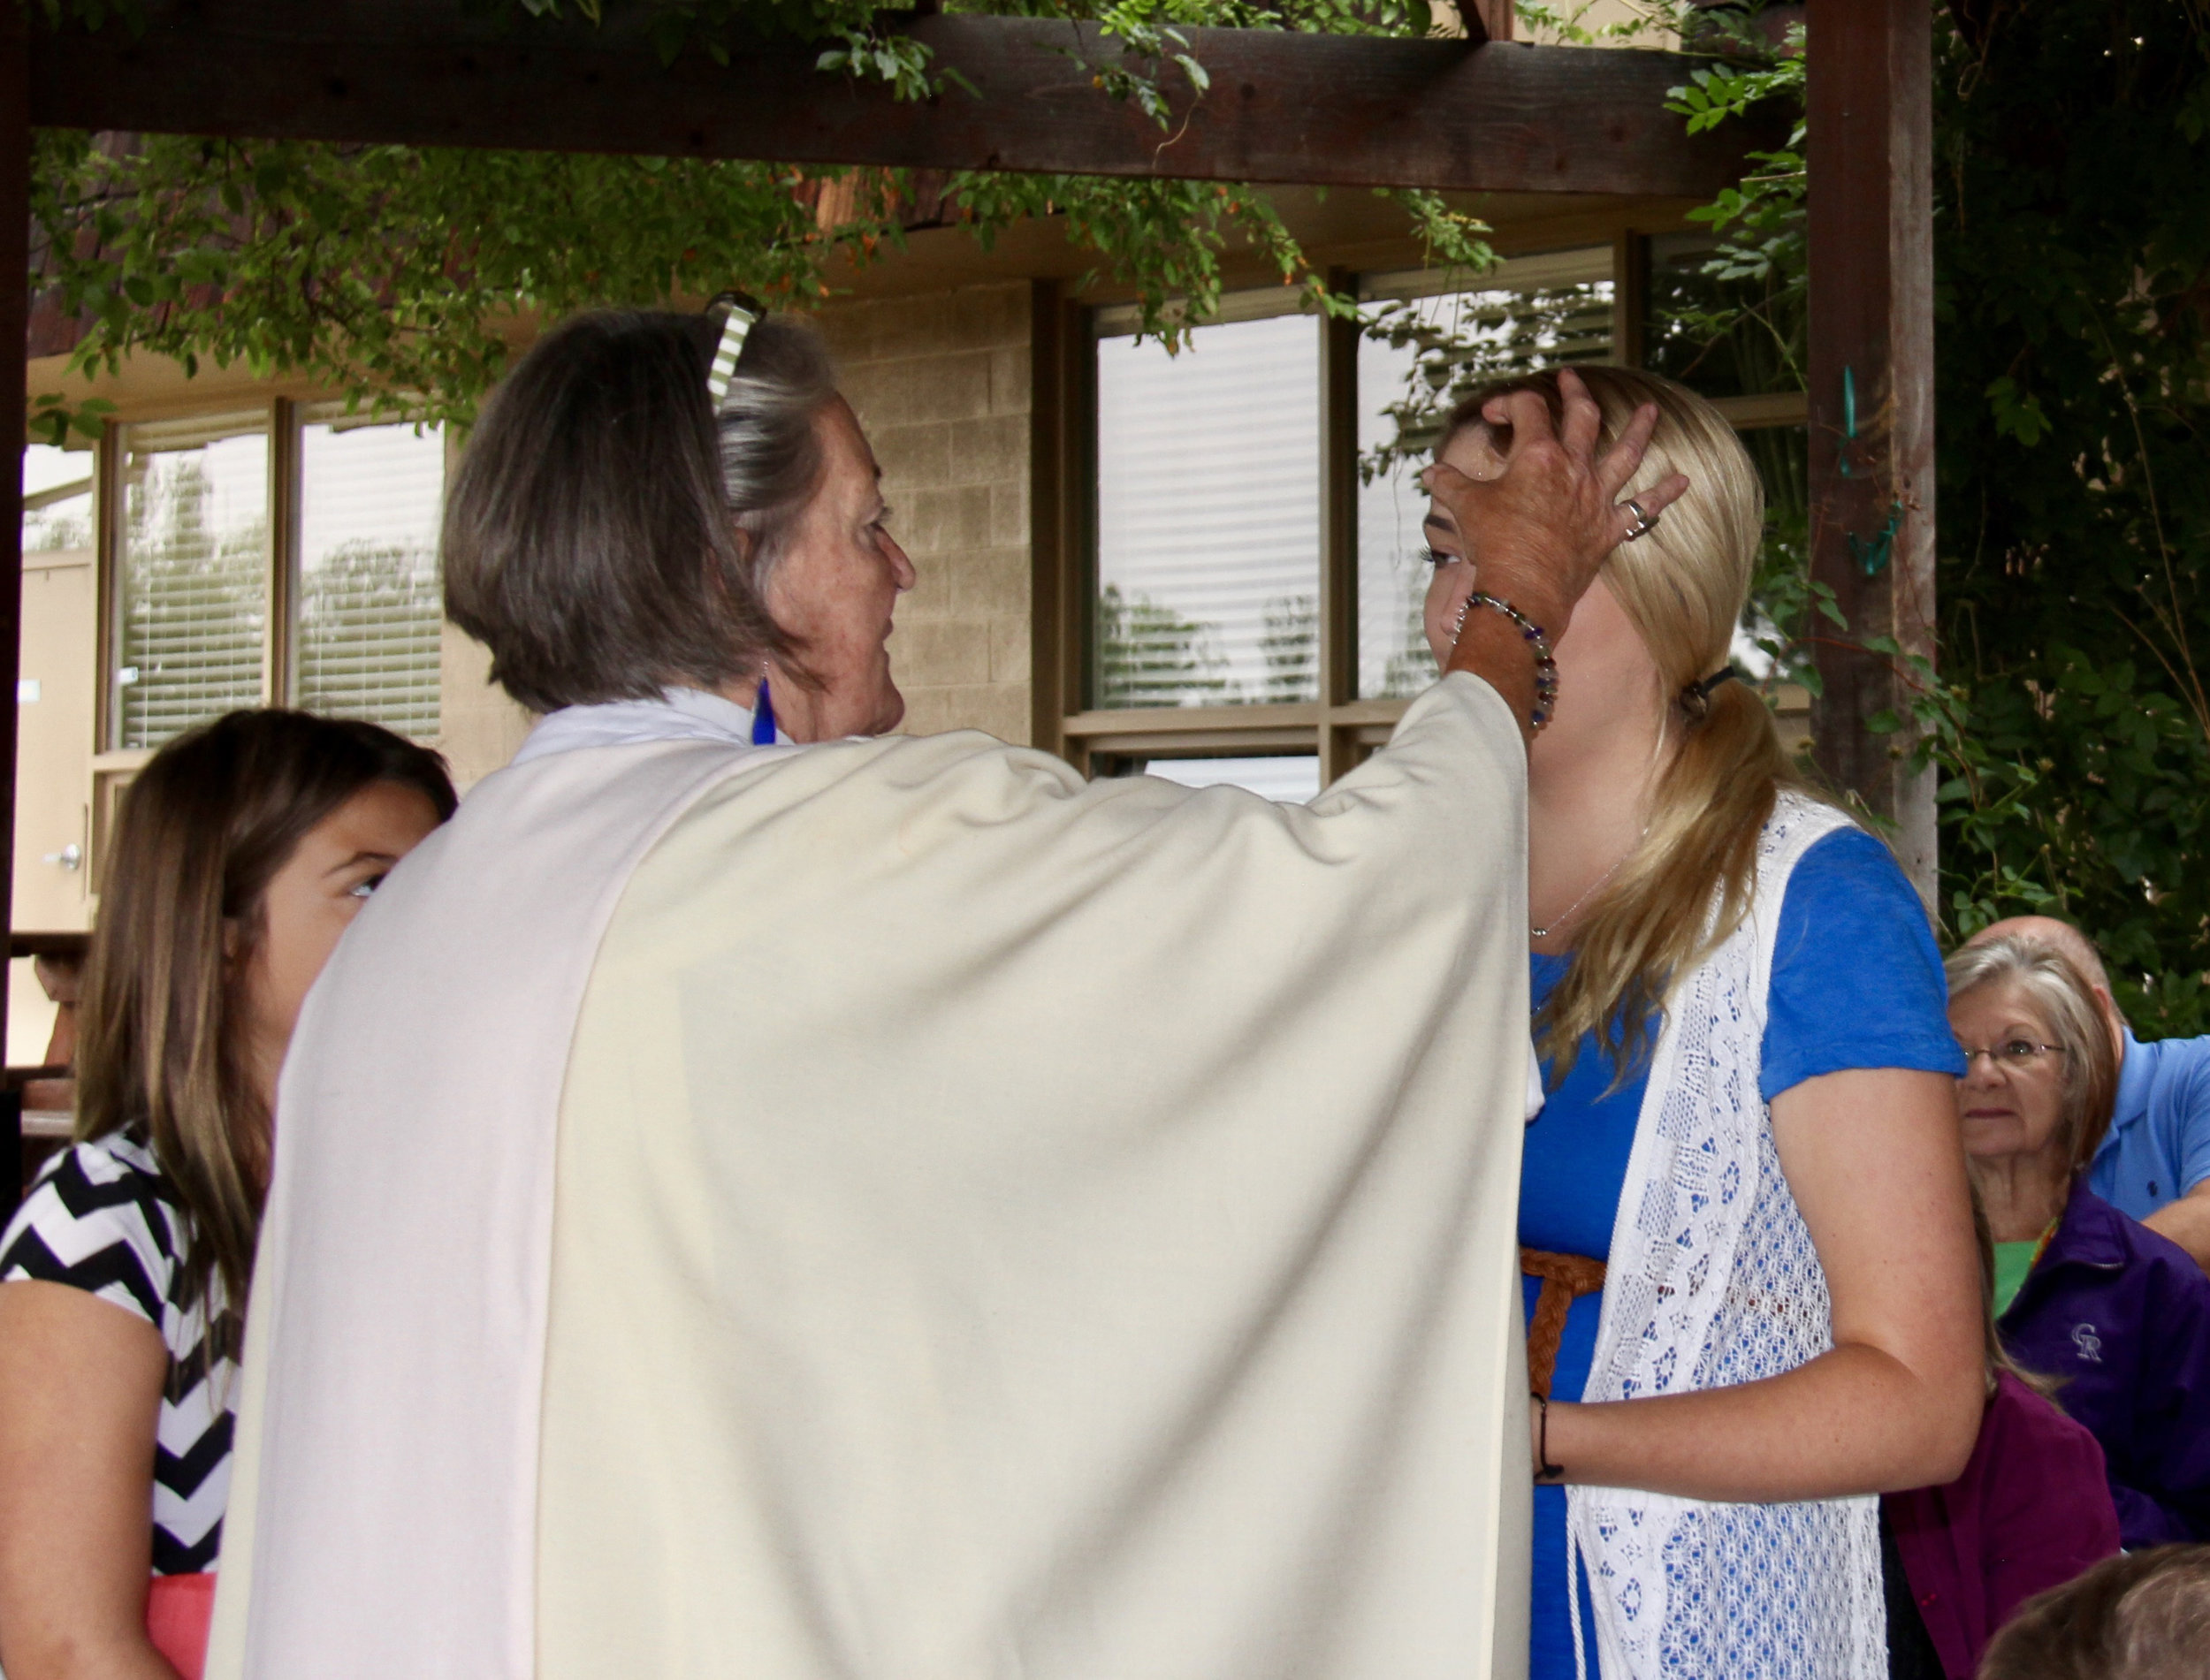 The Reverend Michele Quinn and parishioners celebrate baptisms at St. Joseph Episcopal Church in Lakewood. Photo courtesy Marlene Logan